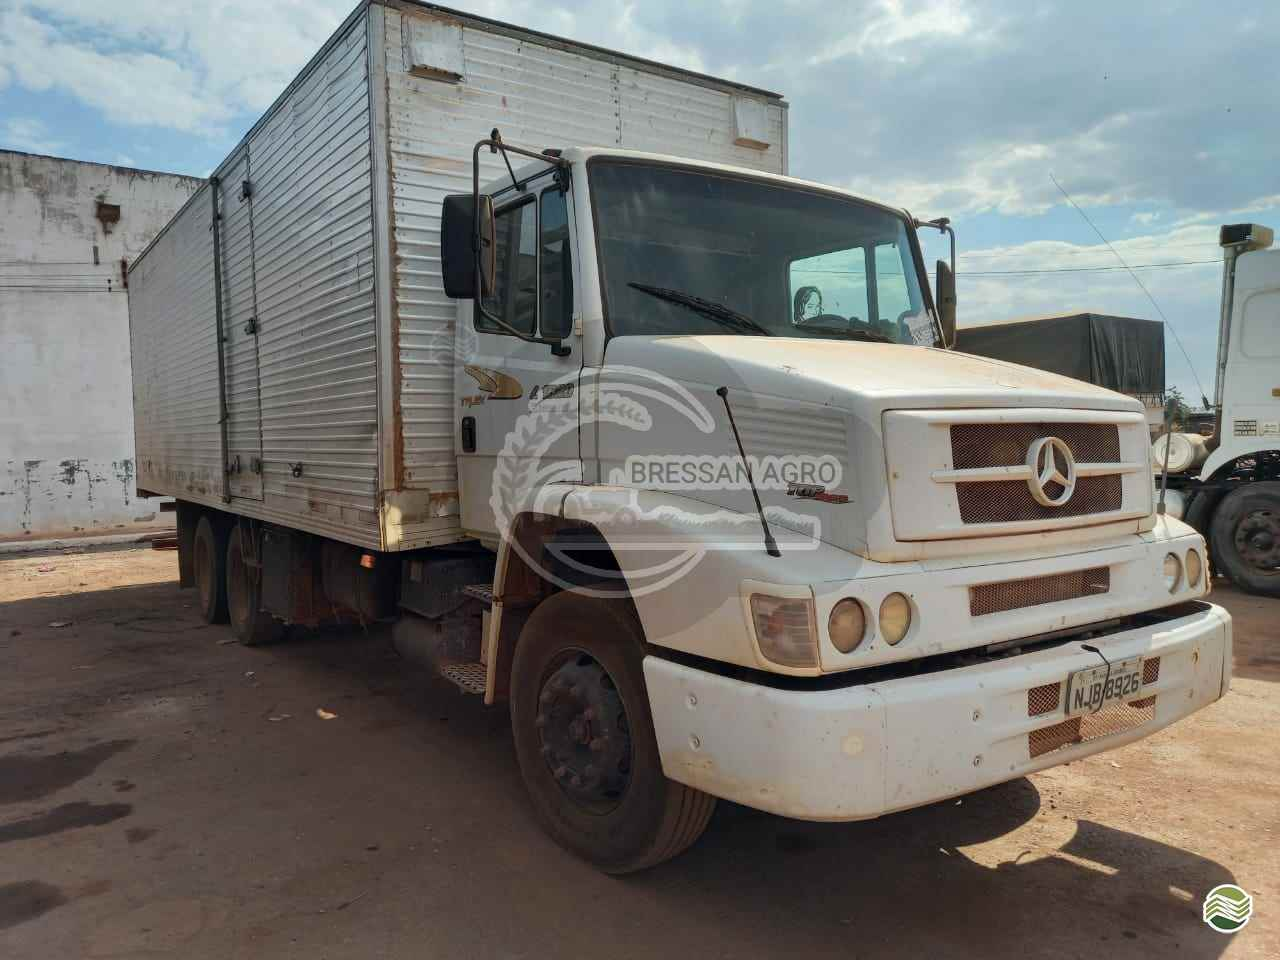 CAMINHAO MERCEDES-BENZ MB 1620 Baú Furgão Truck 6x2 Bressan Agro VARZEA GRANDE MATO GROSSO MT